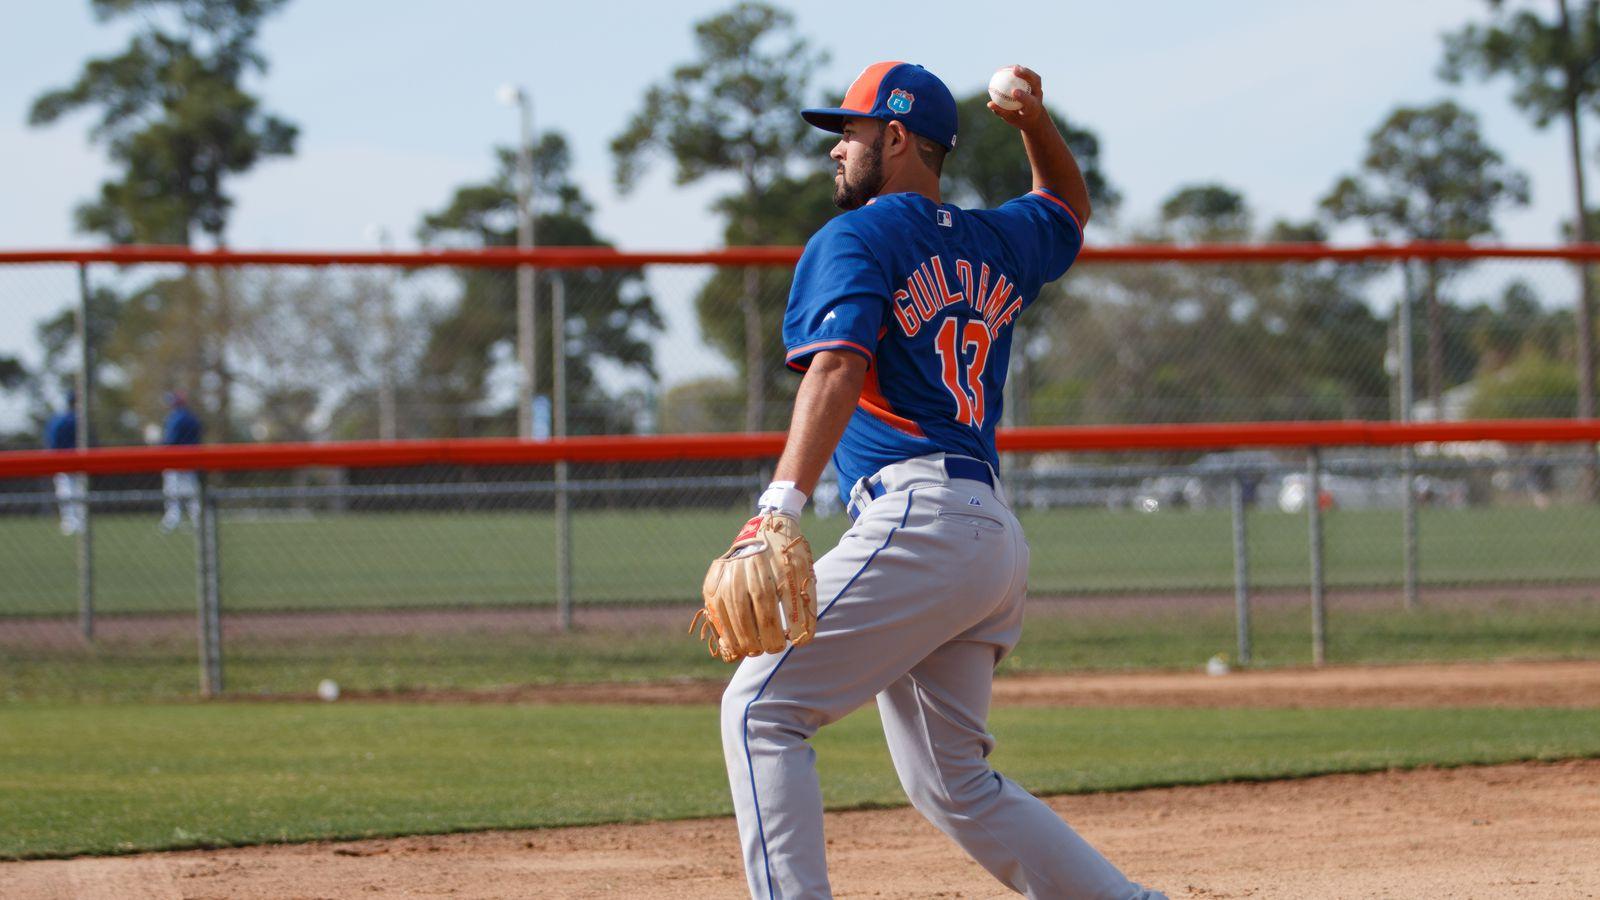 Mets-spring-training-2016-mcshane-2537.0.0